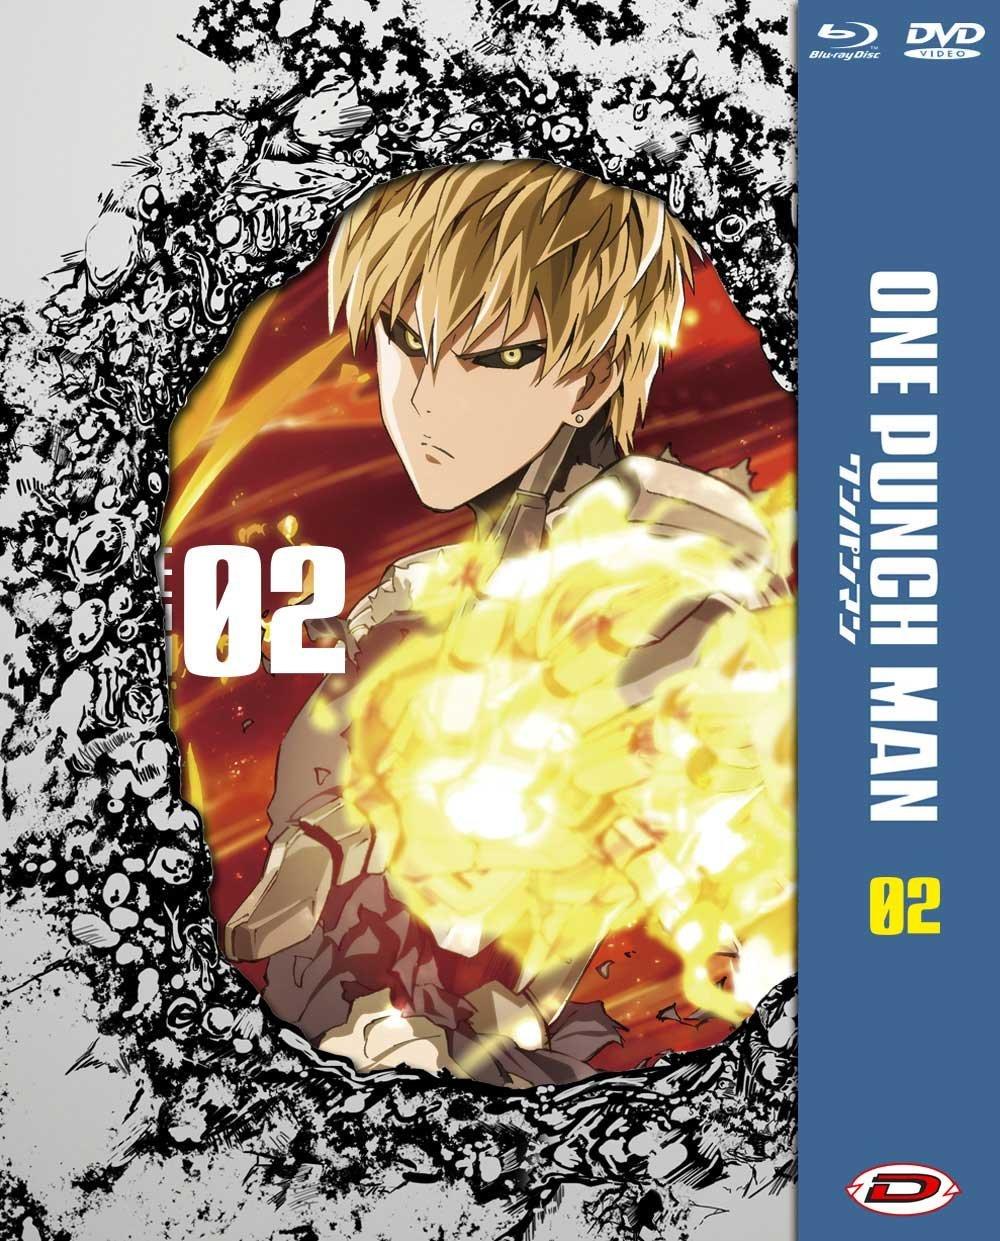 One Punch Man #02 Eps 05-08 Ltd Blu-Ray+Dvd Italia Blu-ray ...